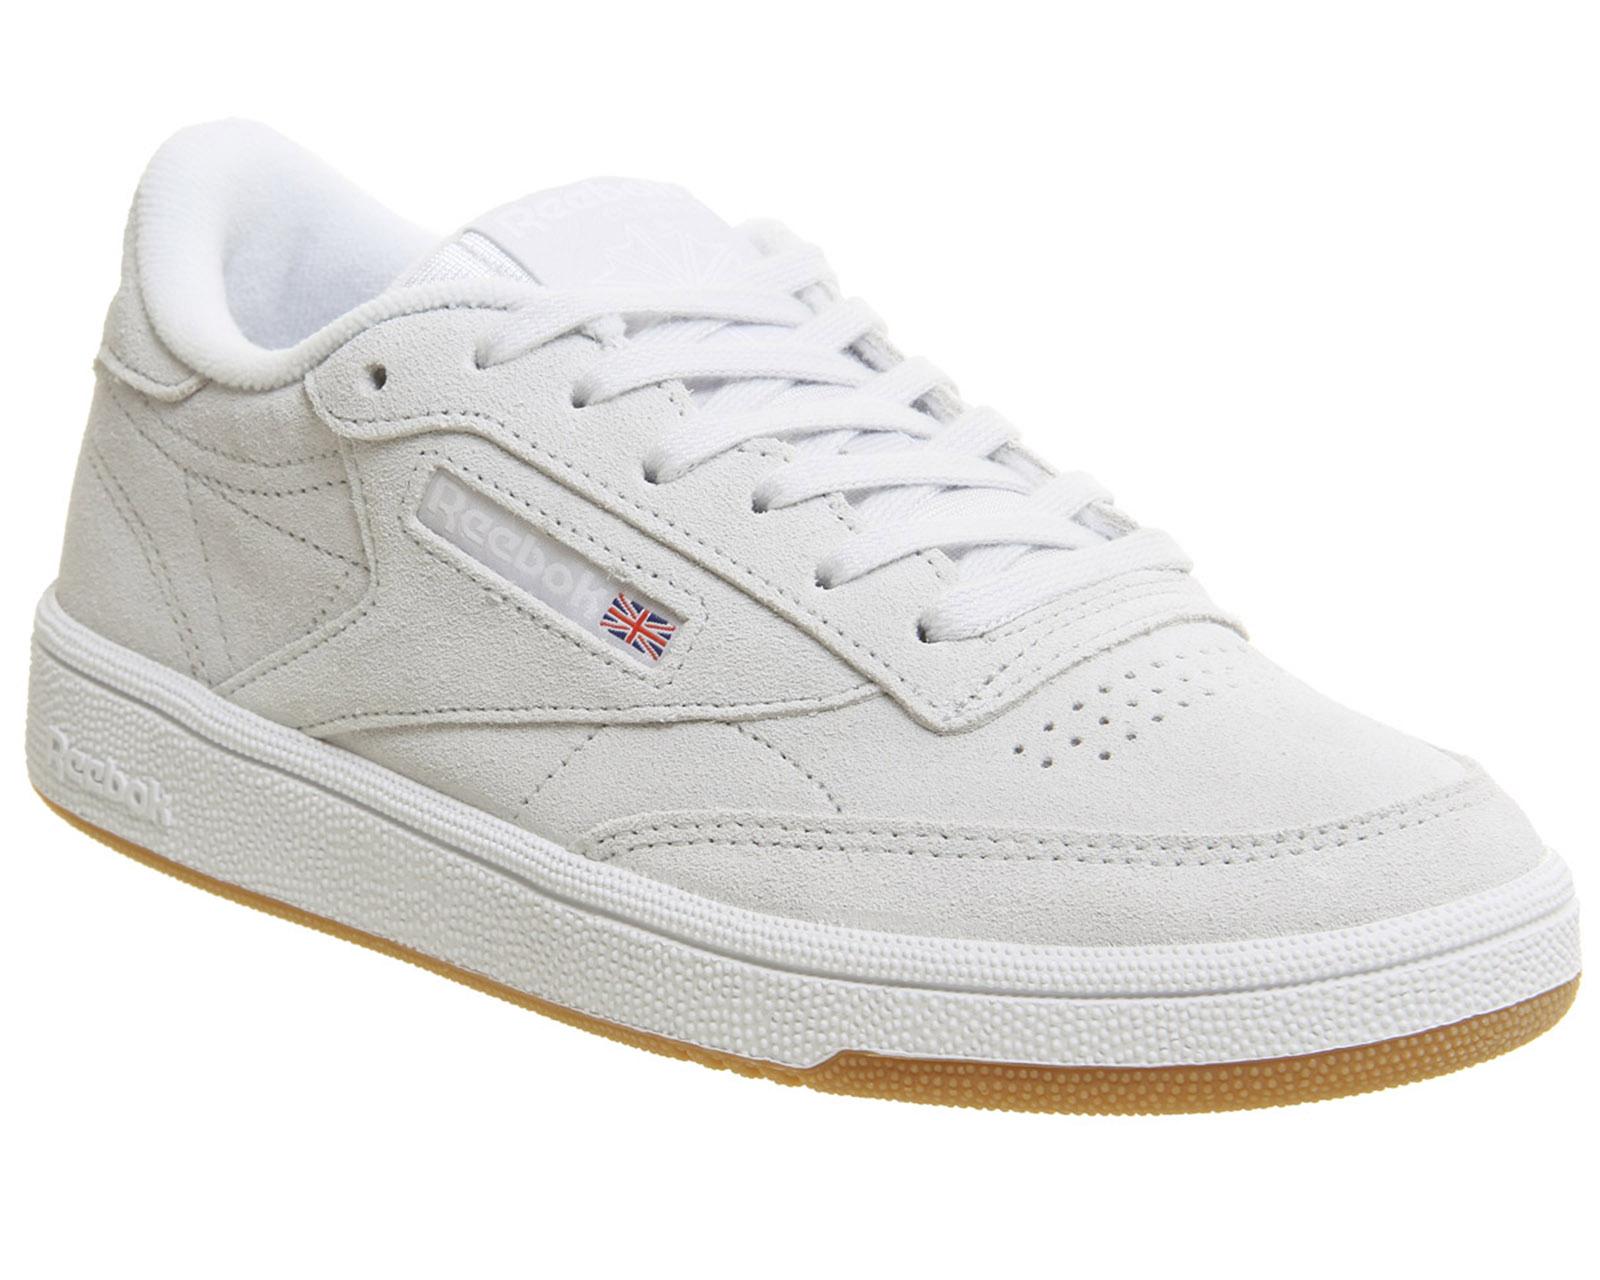 fecacd145ba Sentinel Womens Reebok Club C 85 Trainers Spirit White White Gum Trainers  Shoes